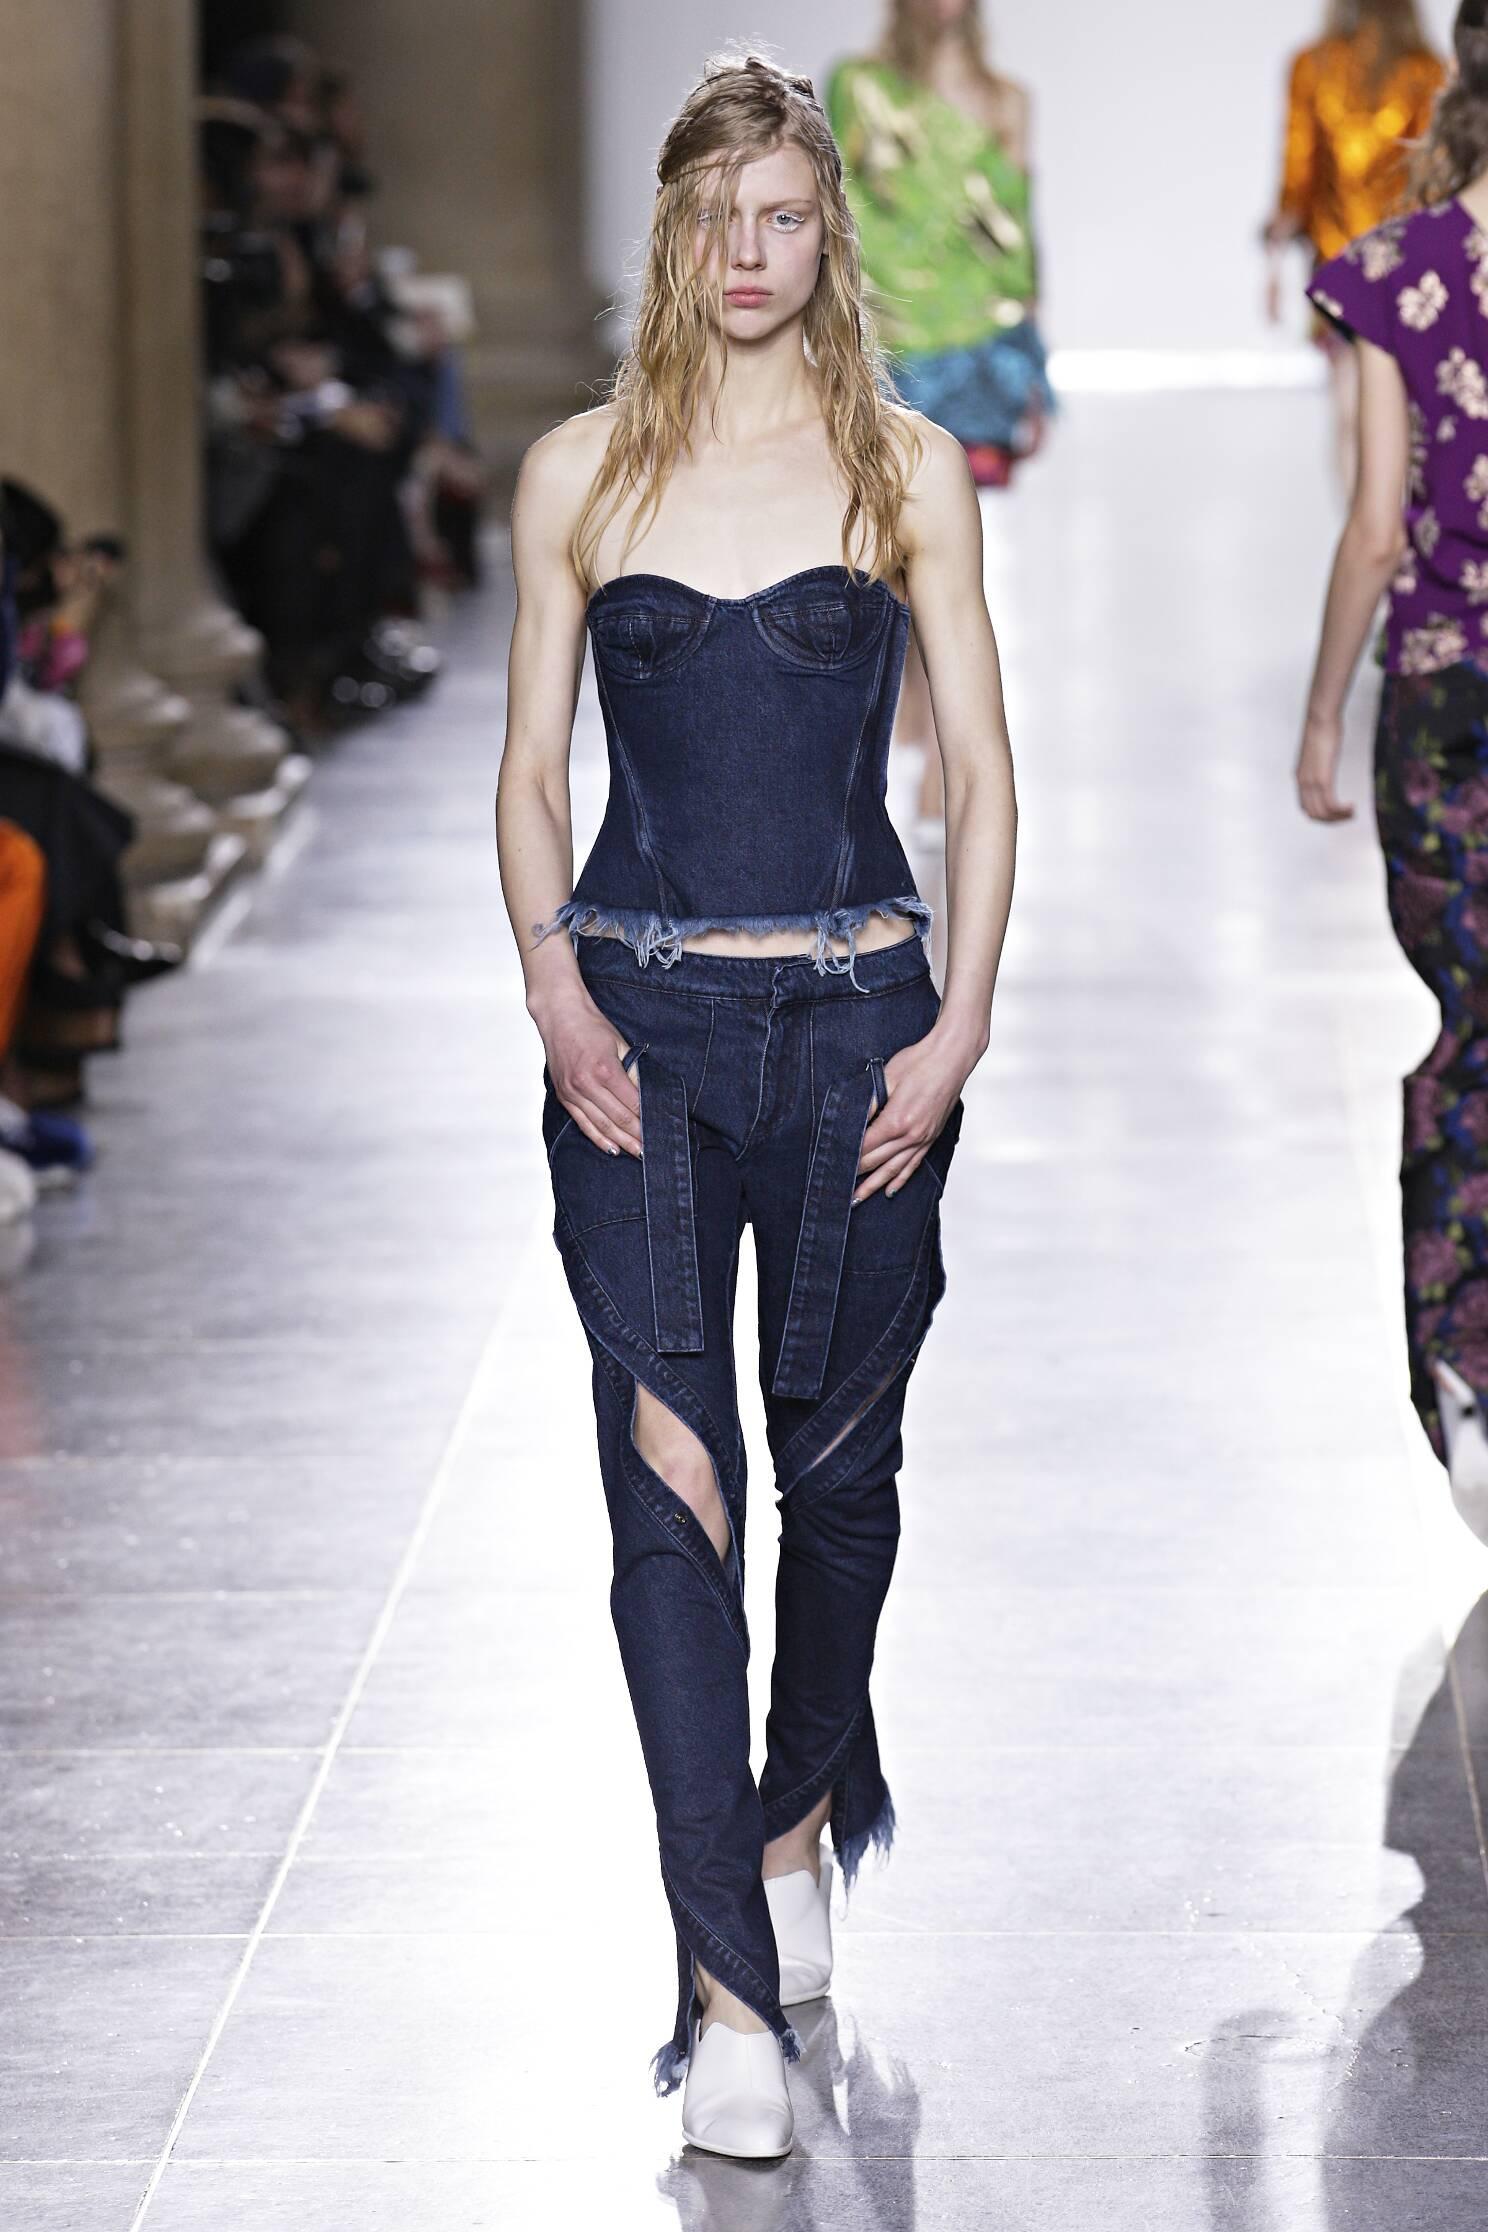 Catwalk Marques Almeida Fall Winter 2015 16 Women's Collection London Fashion Week